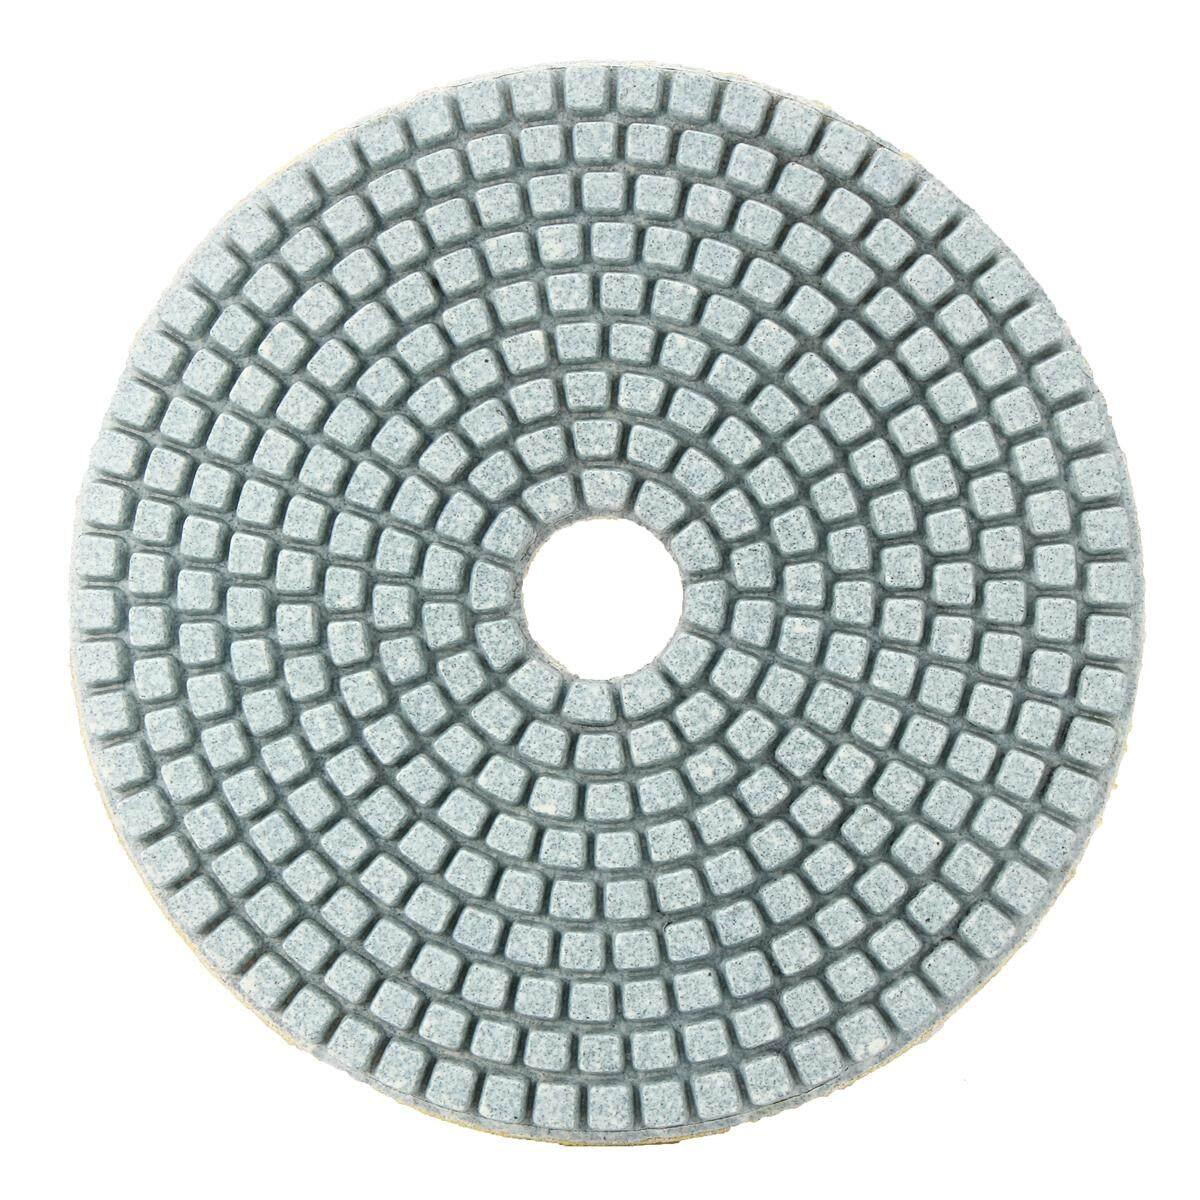 5 Inch 100 Grit Model Wet Dry Diamond Polishing Pads Sanding Disc Concrete Granite Glass Marble